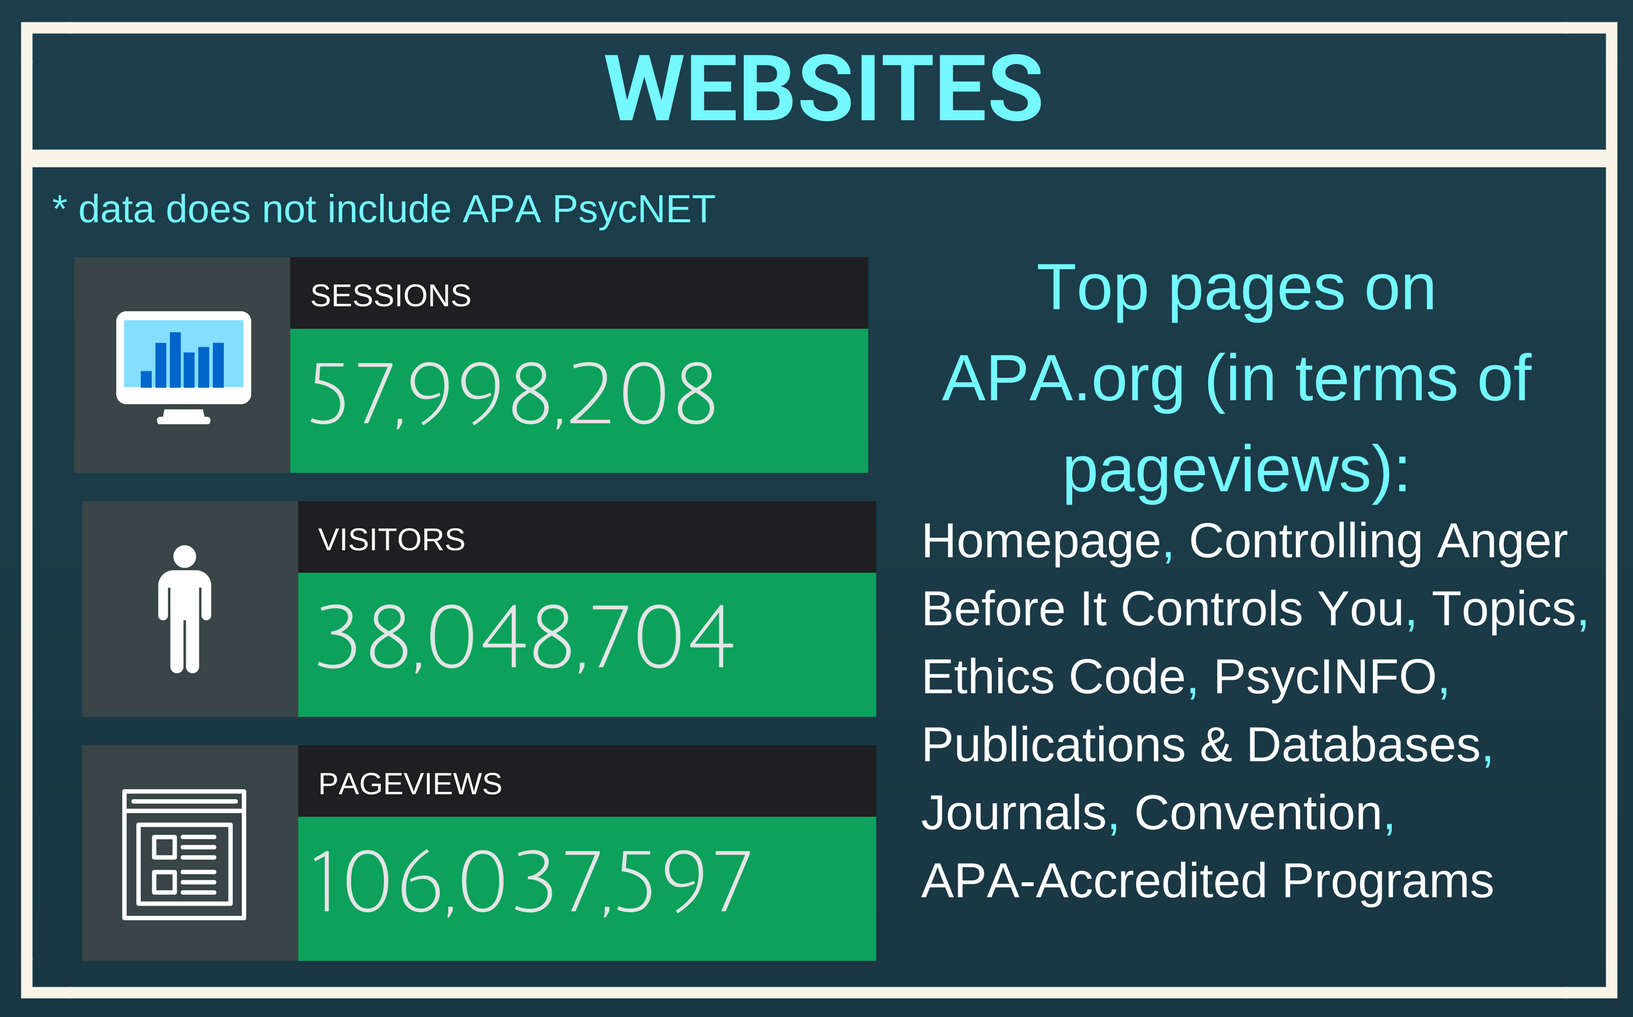 APA websites 2016